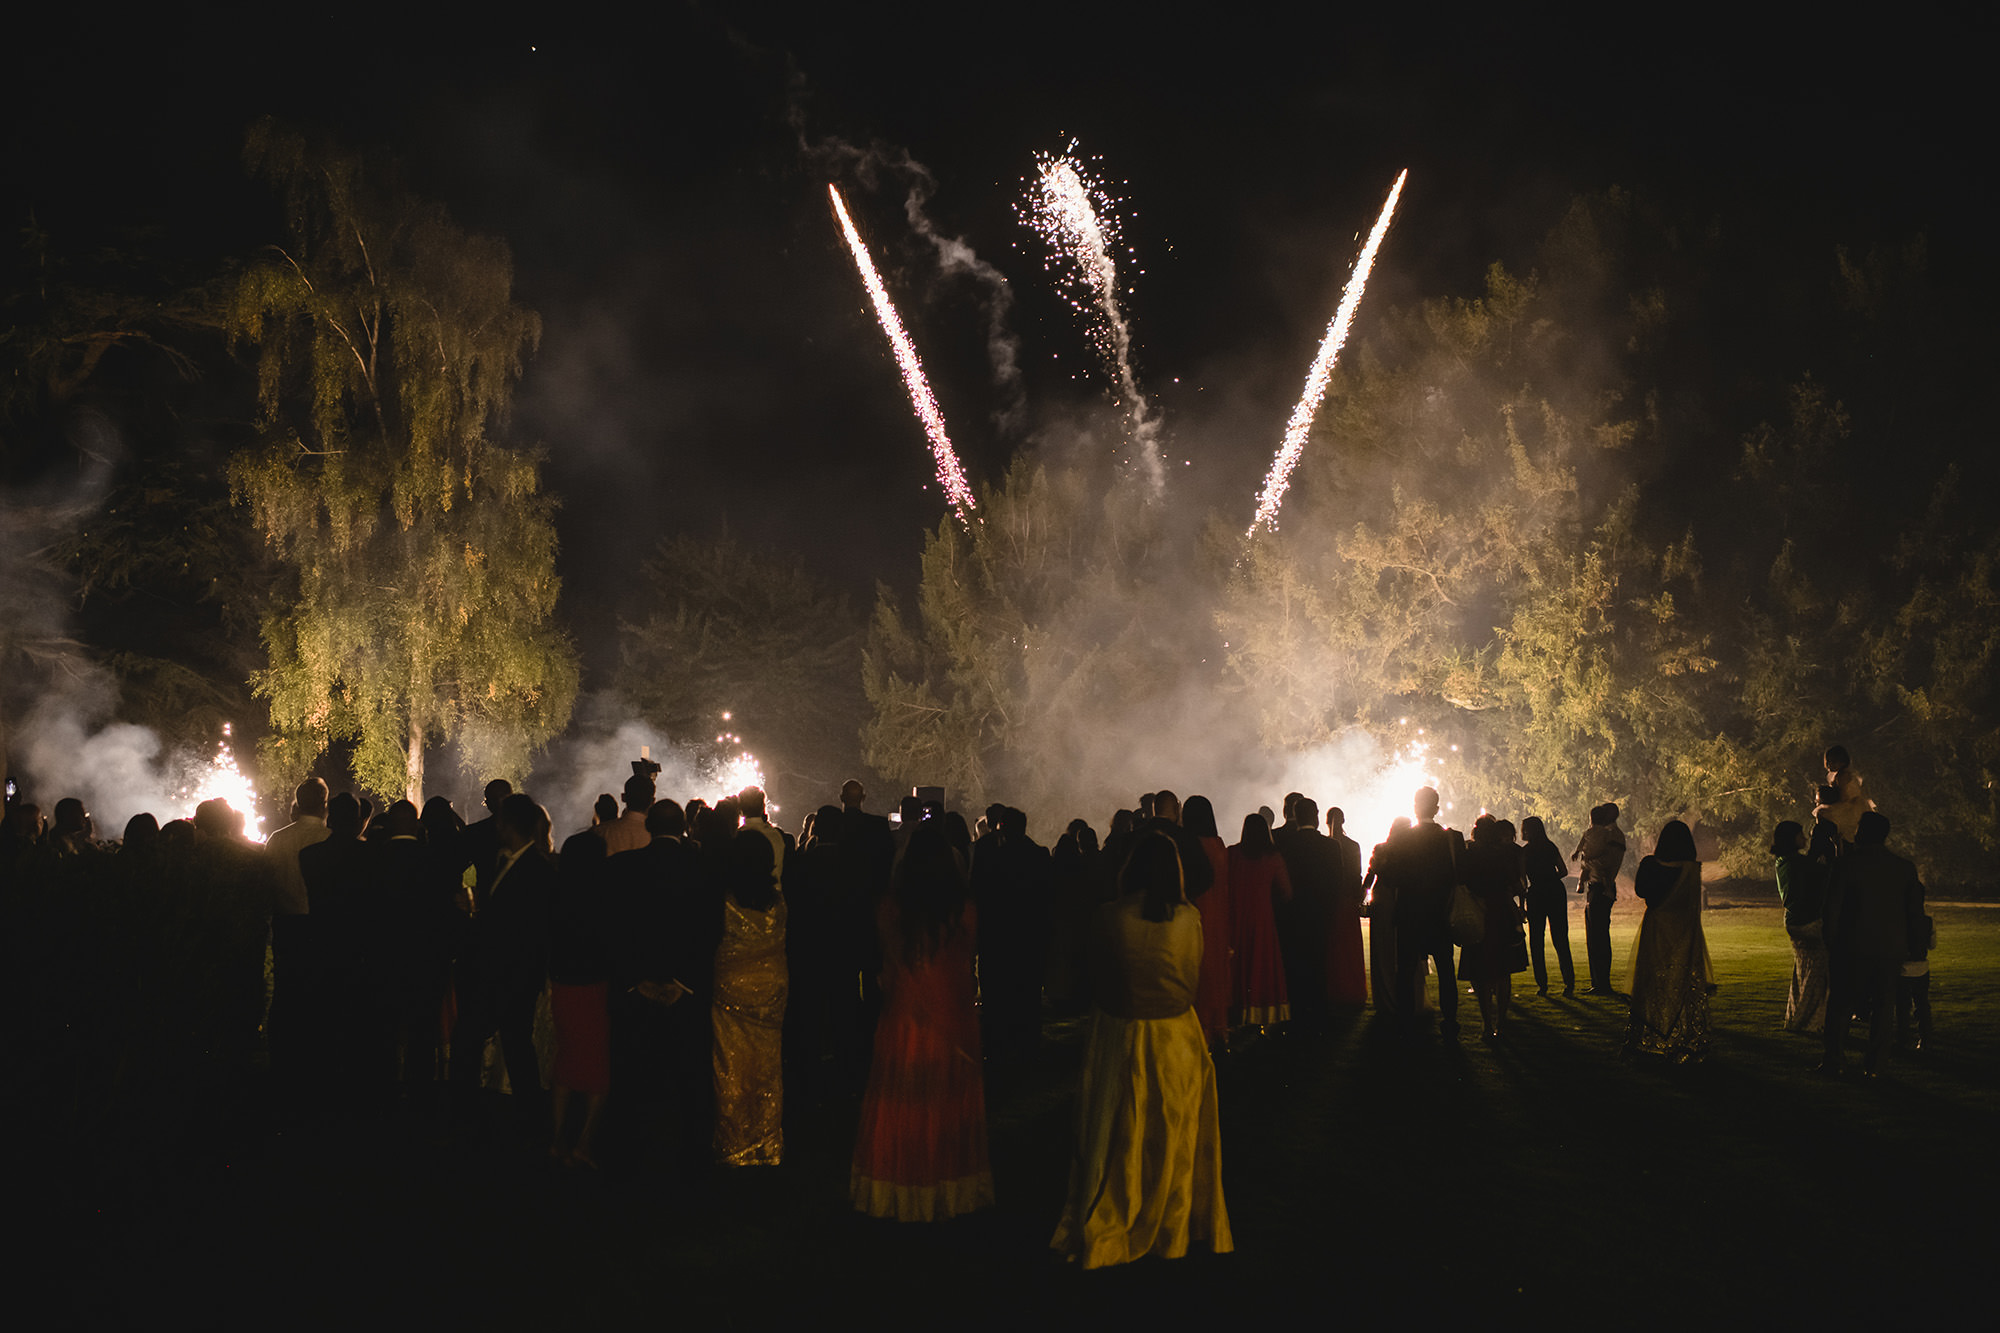 stapleford park fireworks during wedding reception